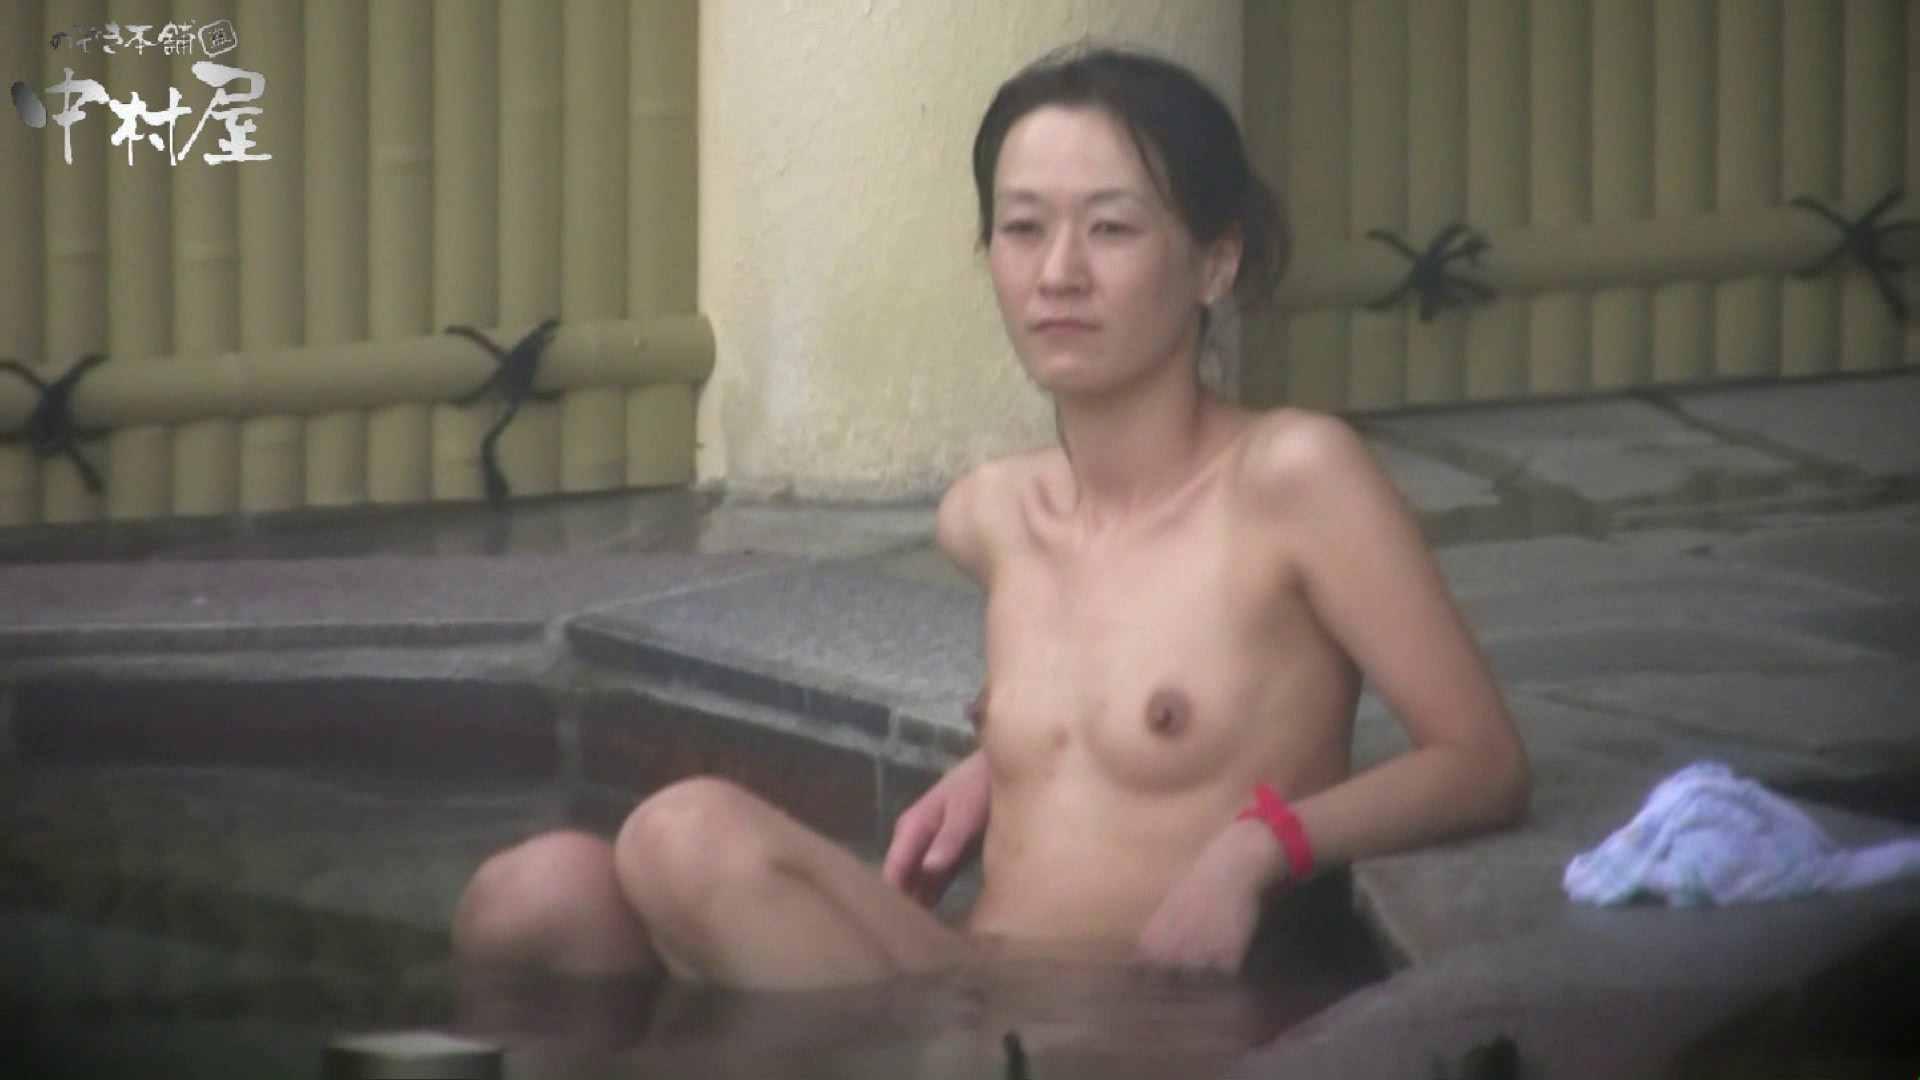 Aquaな露天風呂Vol.928 OLセックス  99画像 93